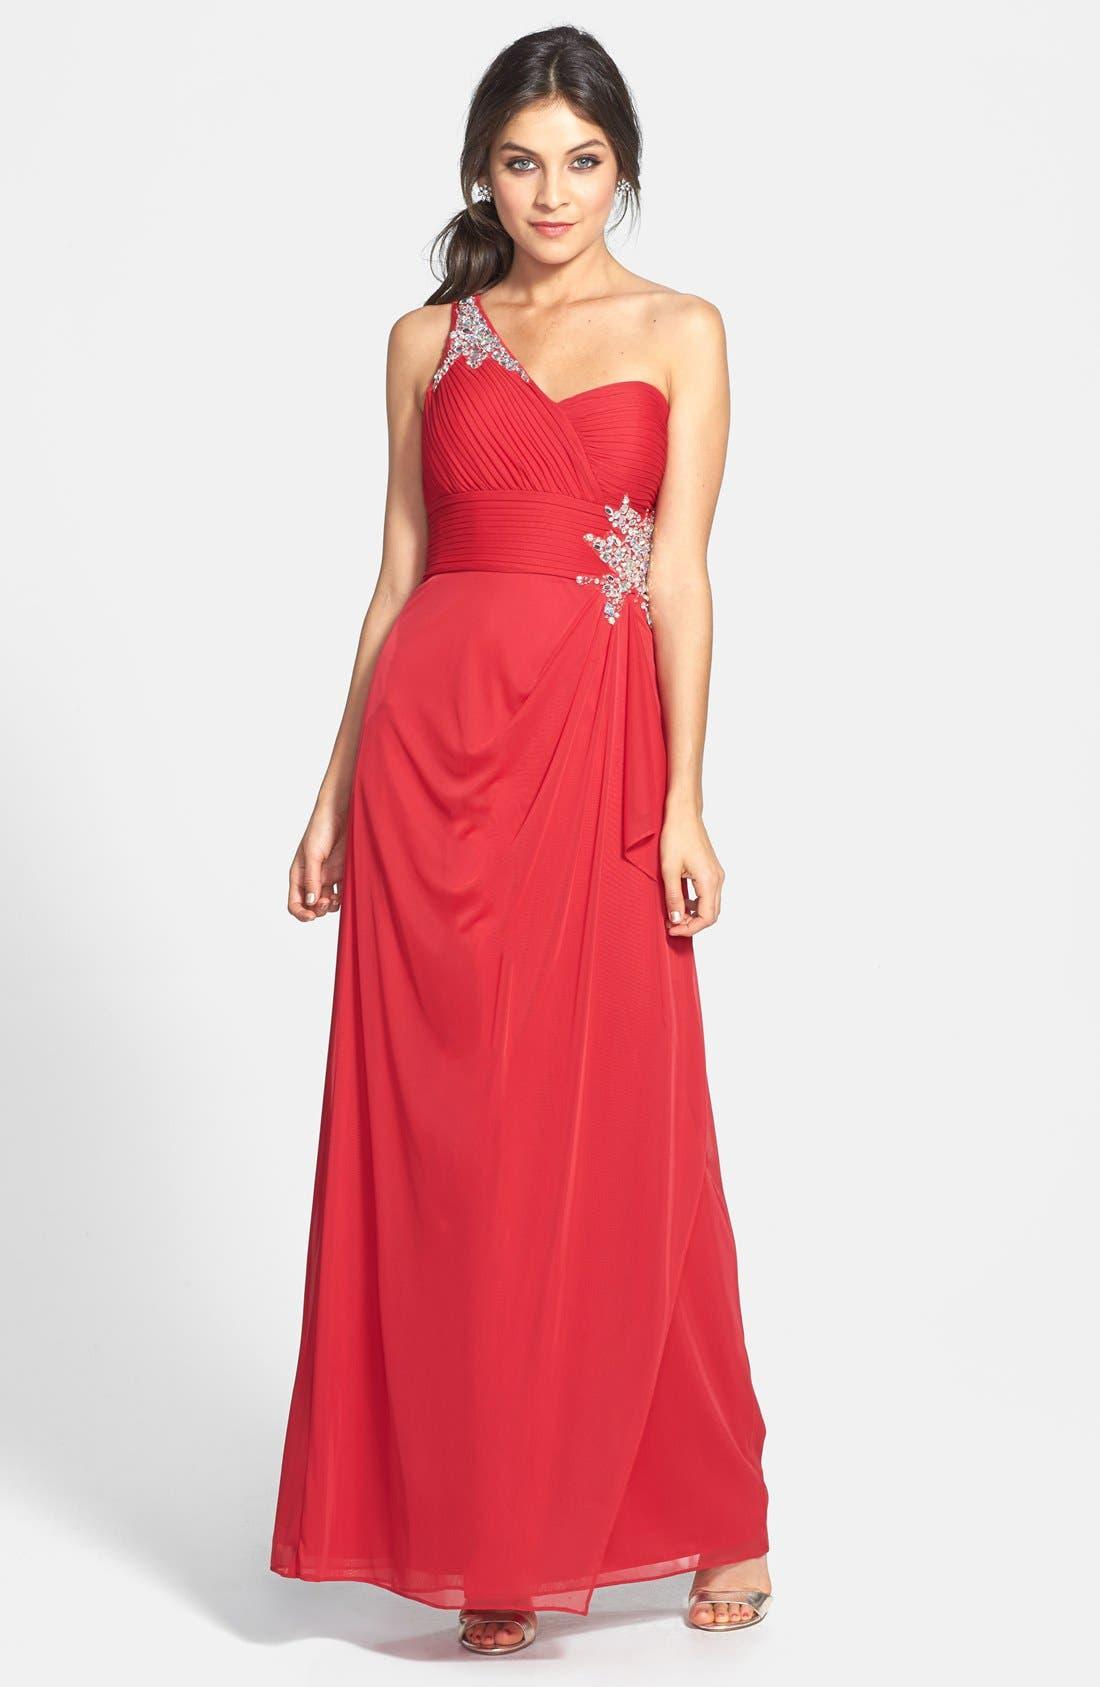 Main Image - Xscape Embellished One-Shoulder Gown